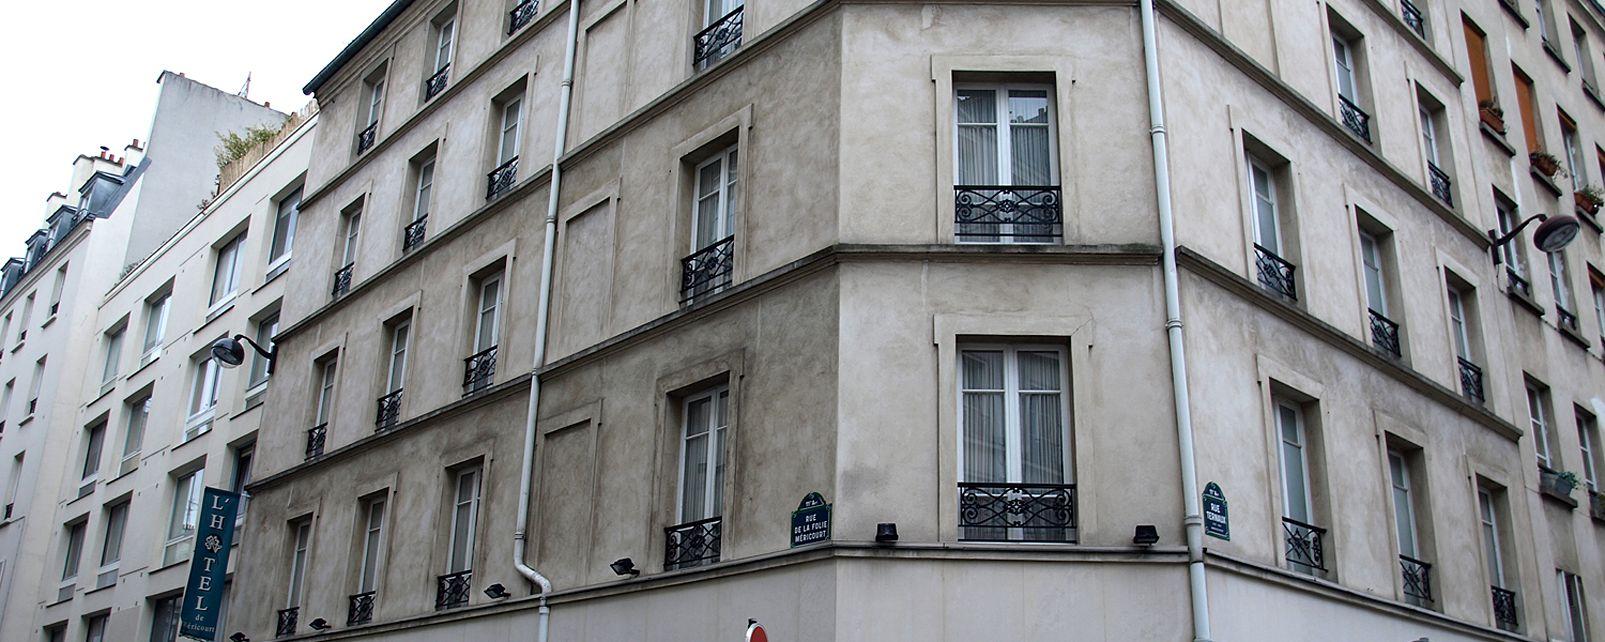 Hotel De La Folie Mericourt